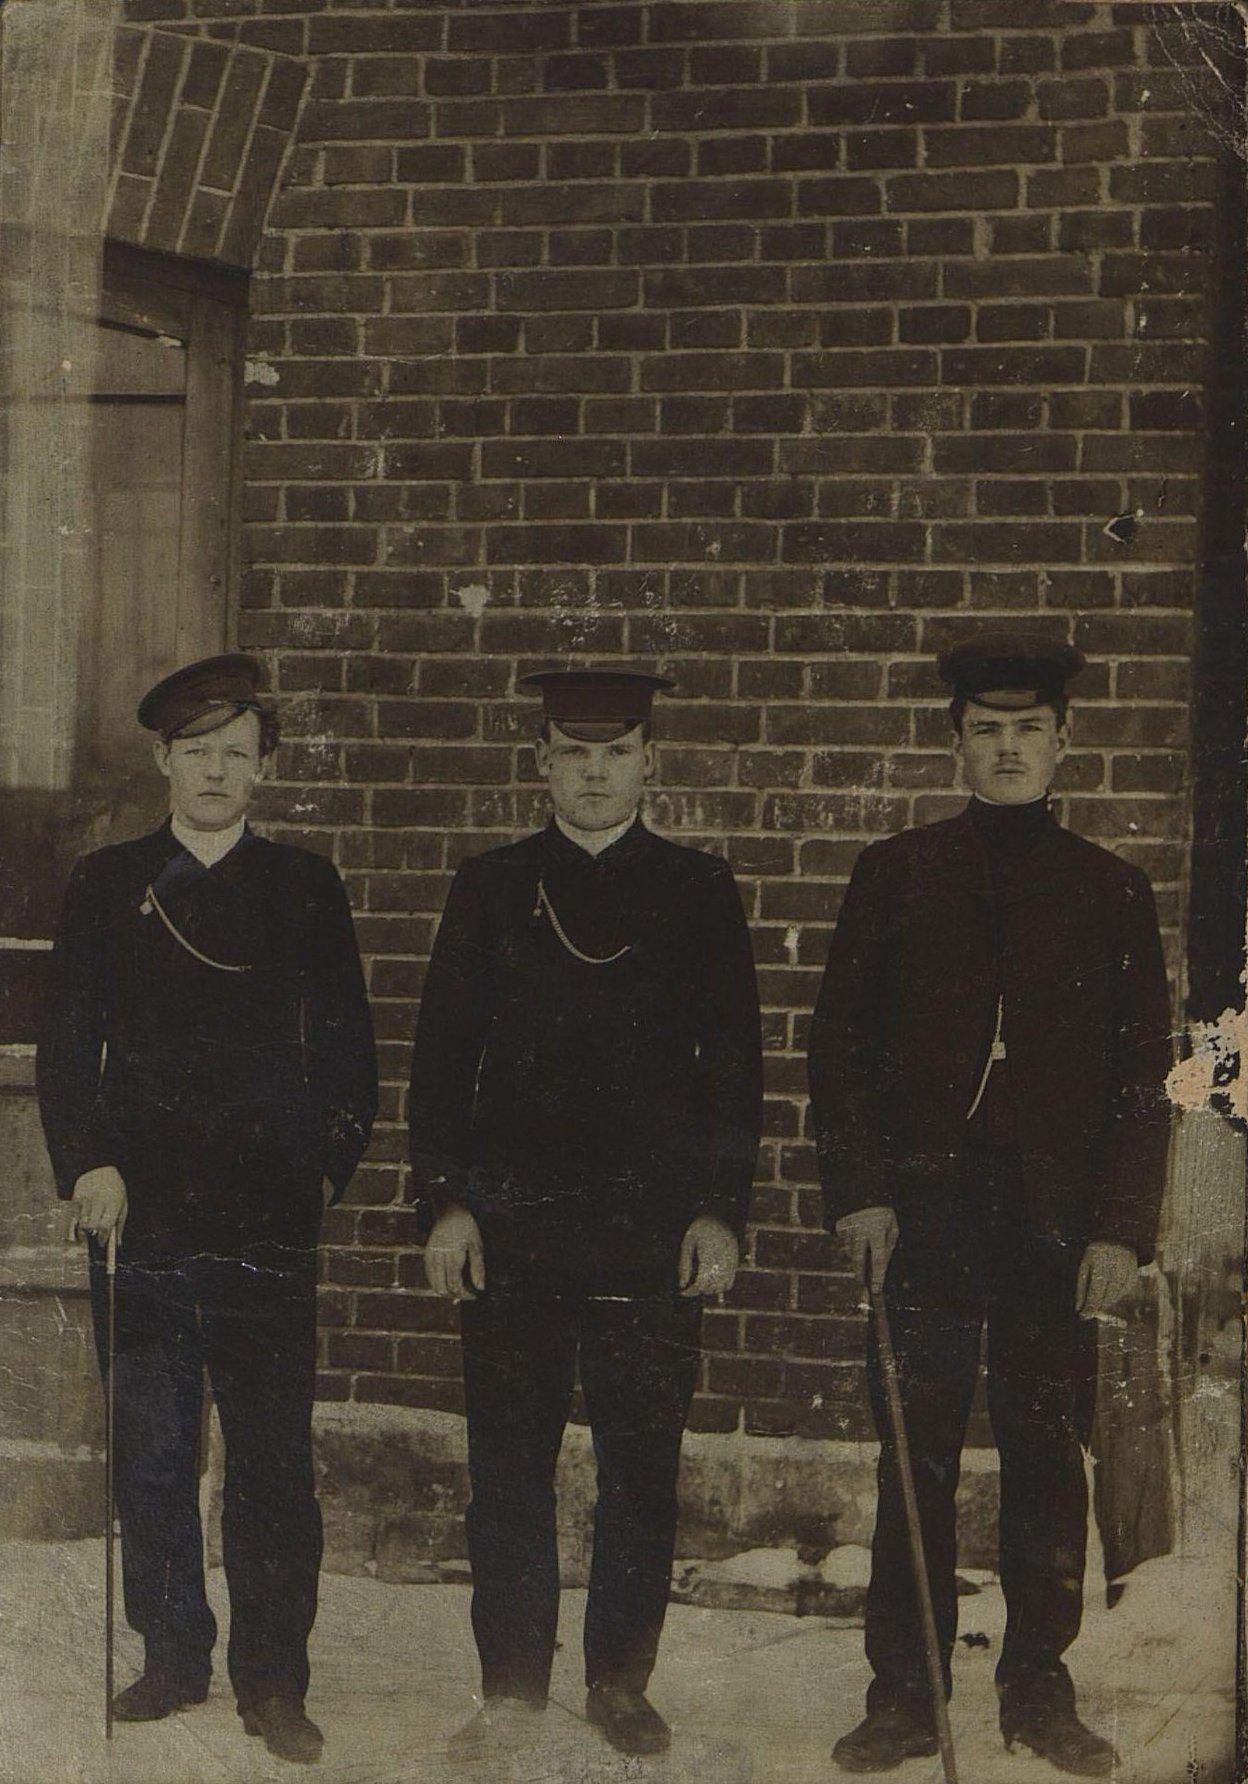 1905. Уткин С.Д. с товарищами на сахарном заводе